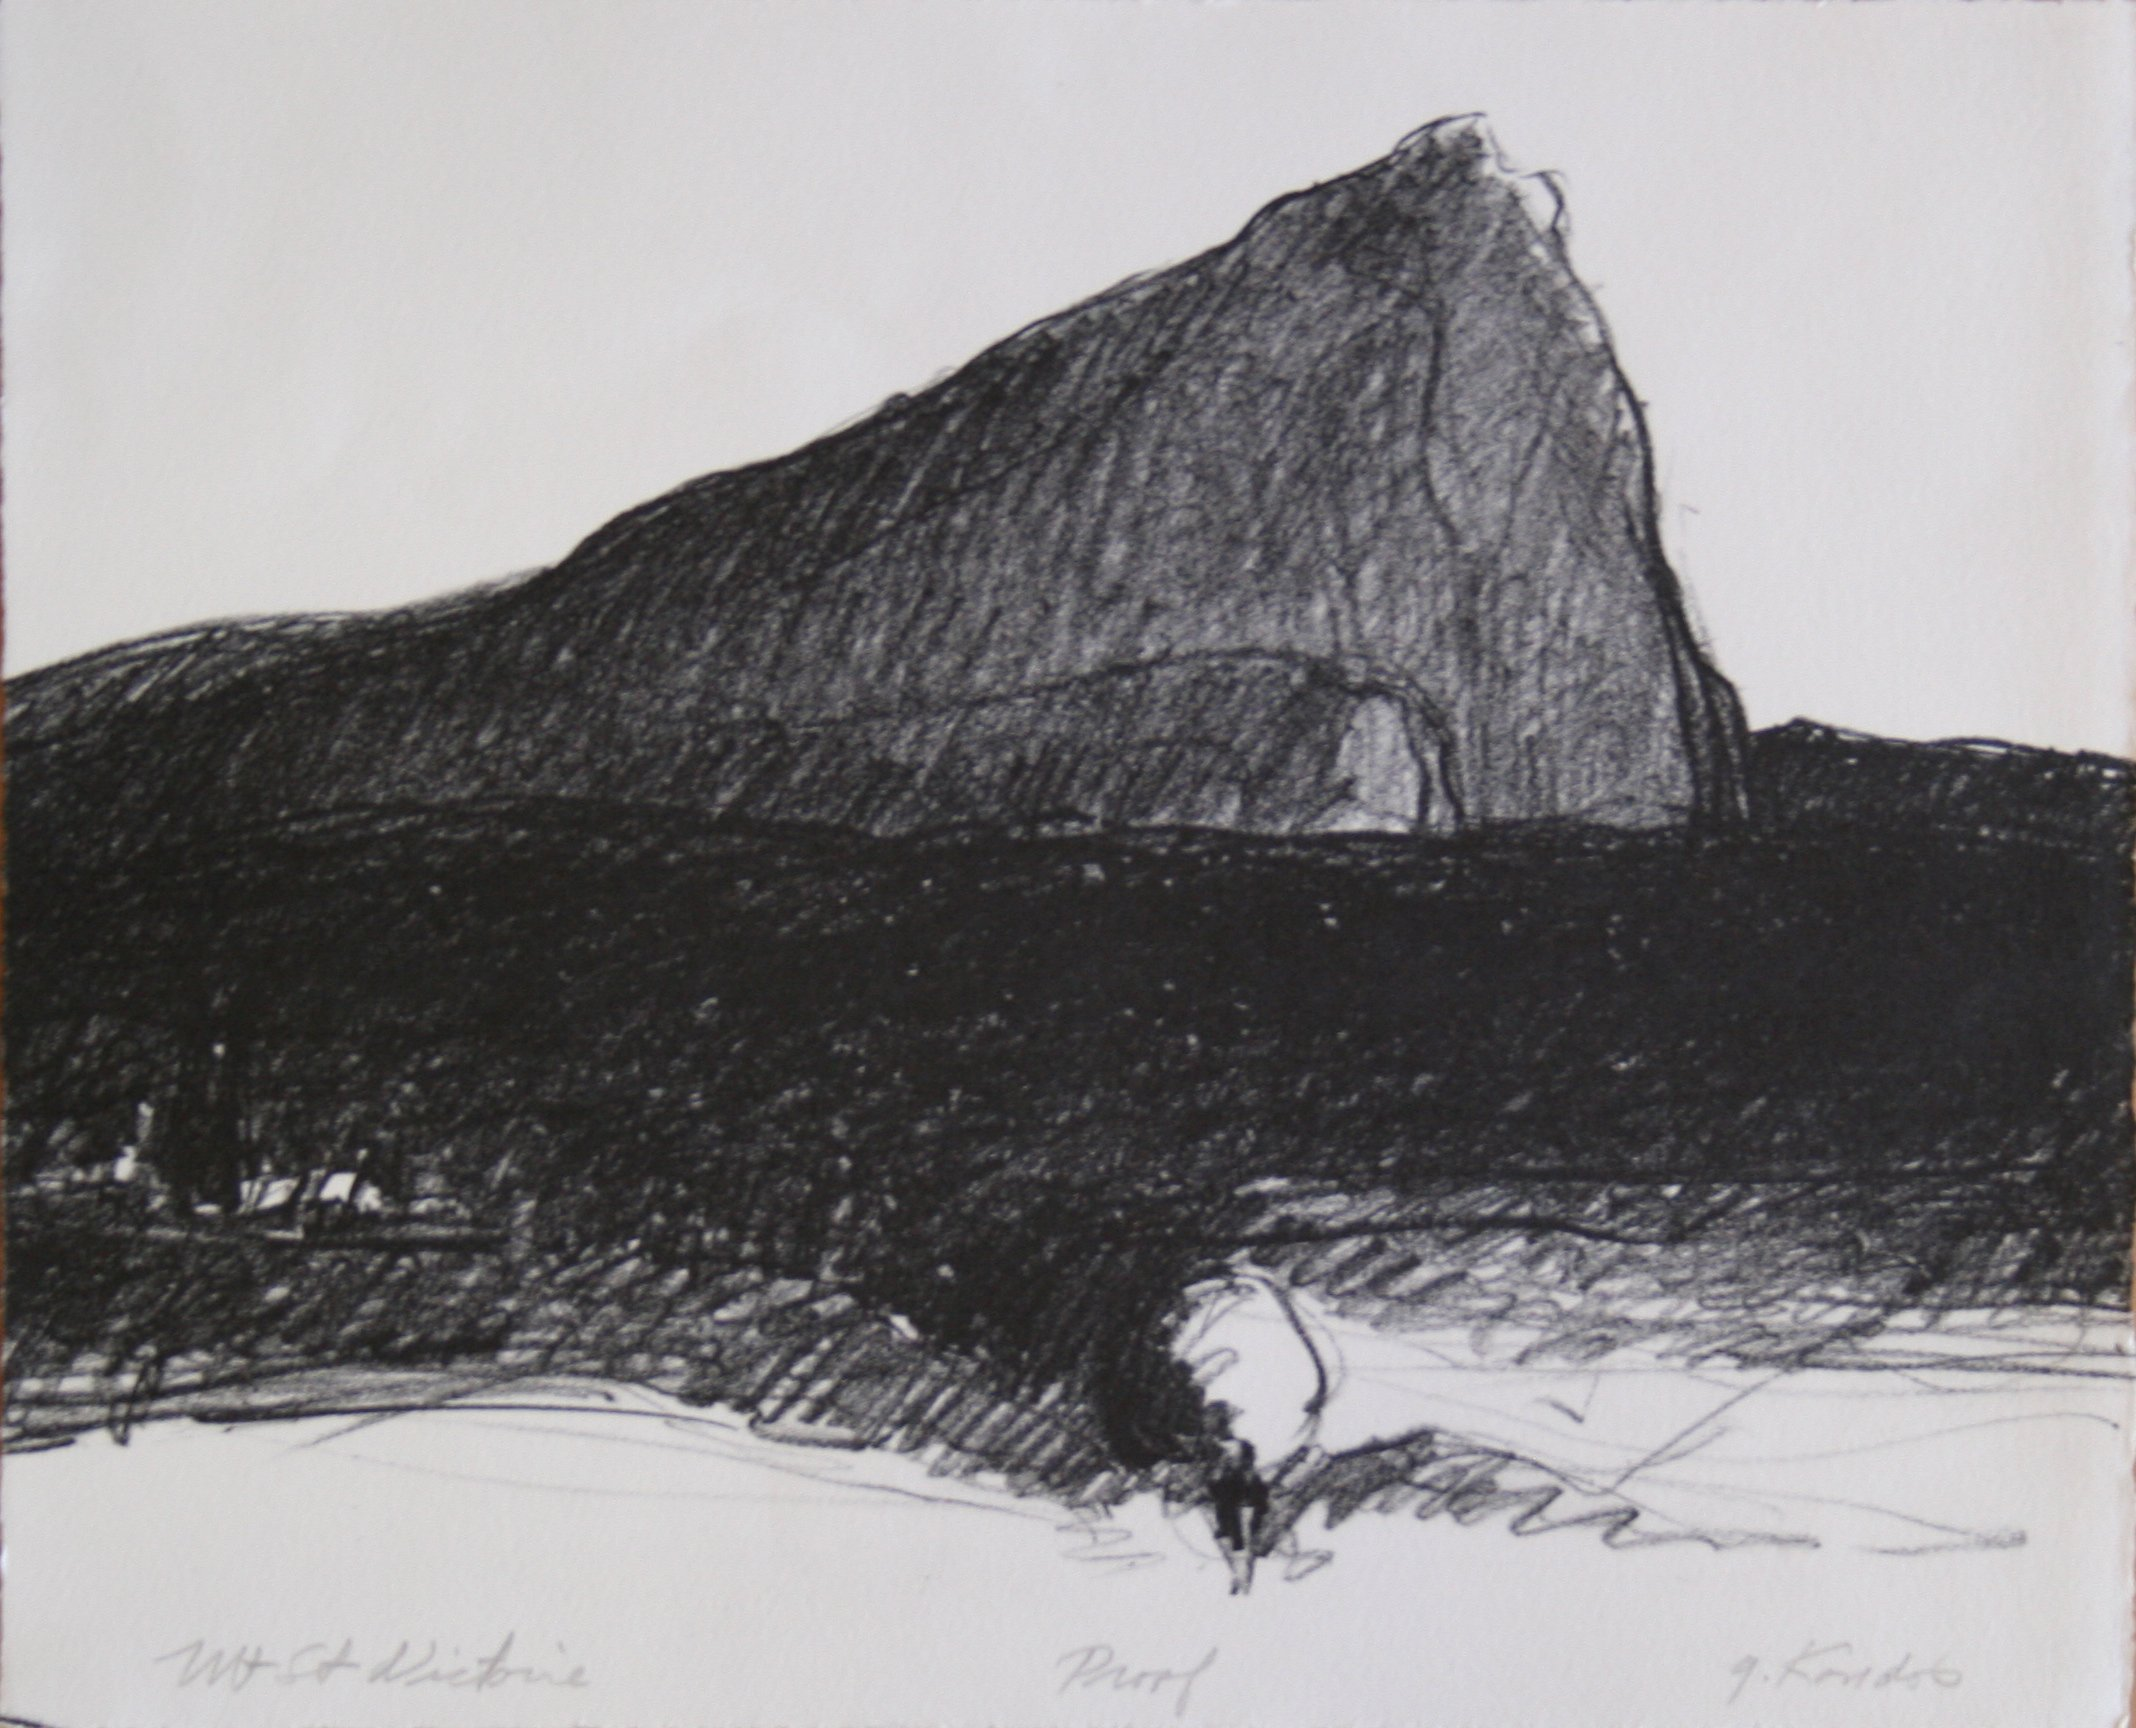 Gregory Kondos Mt. St. Victoire